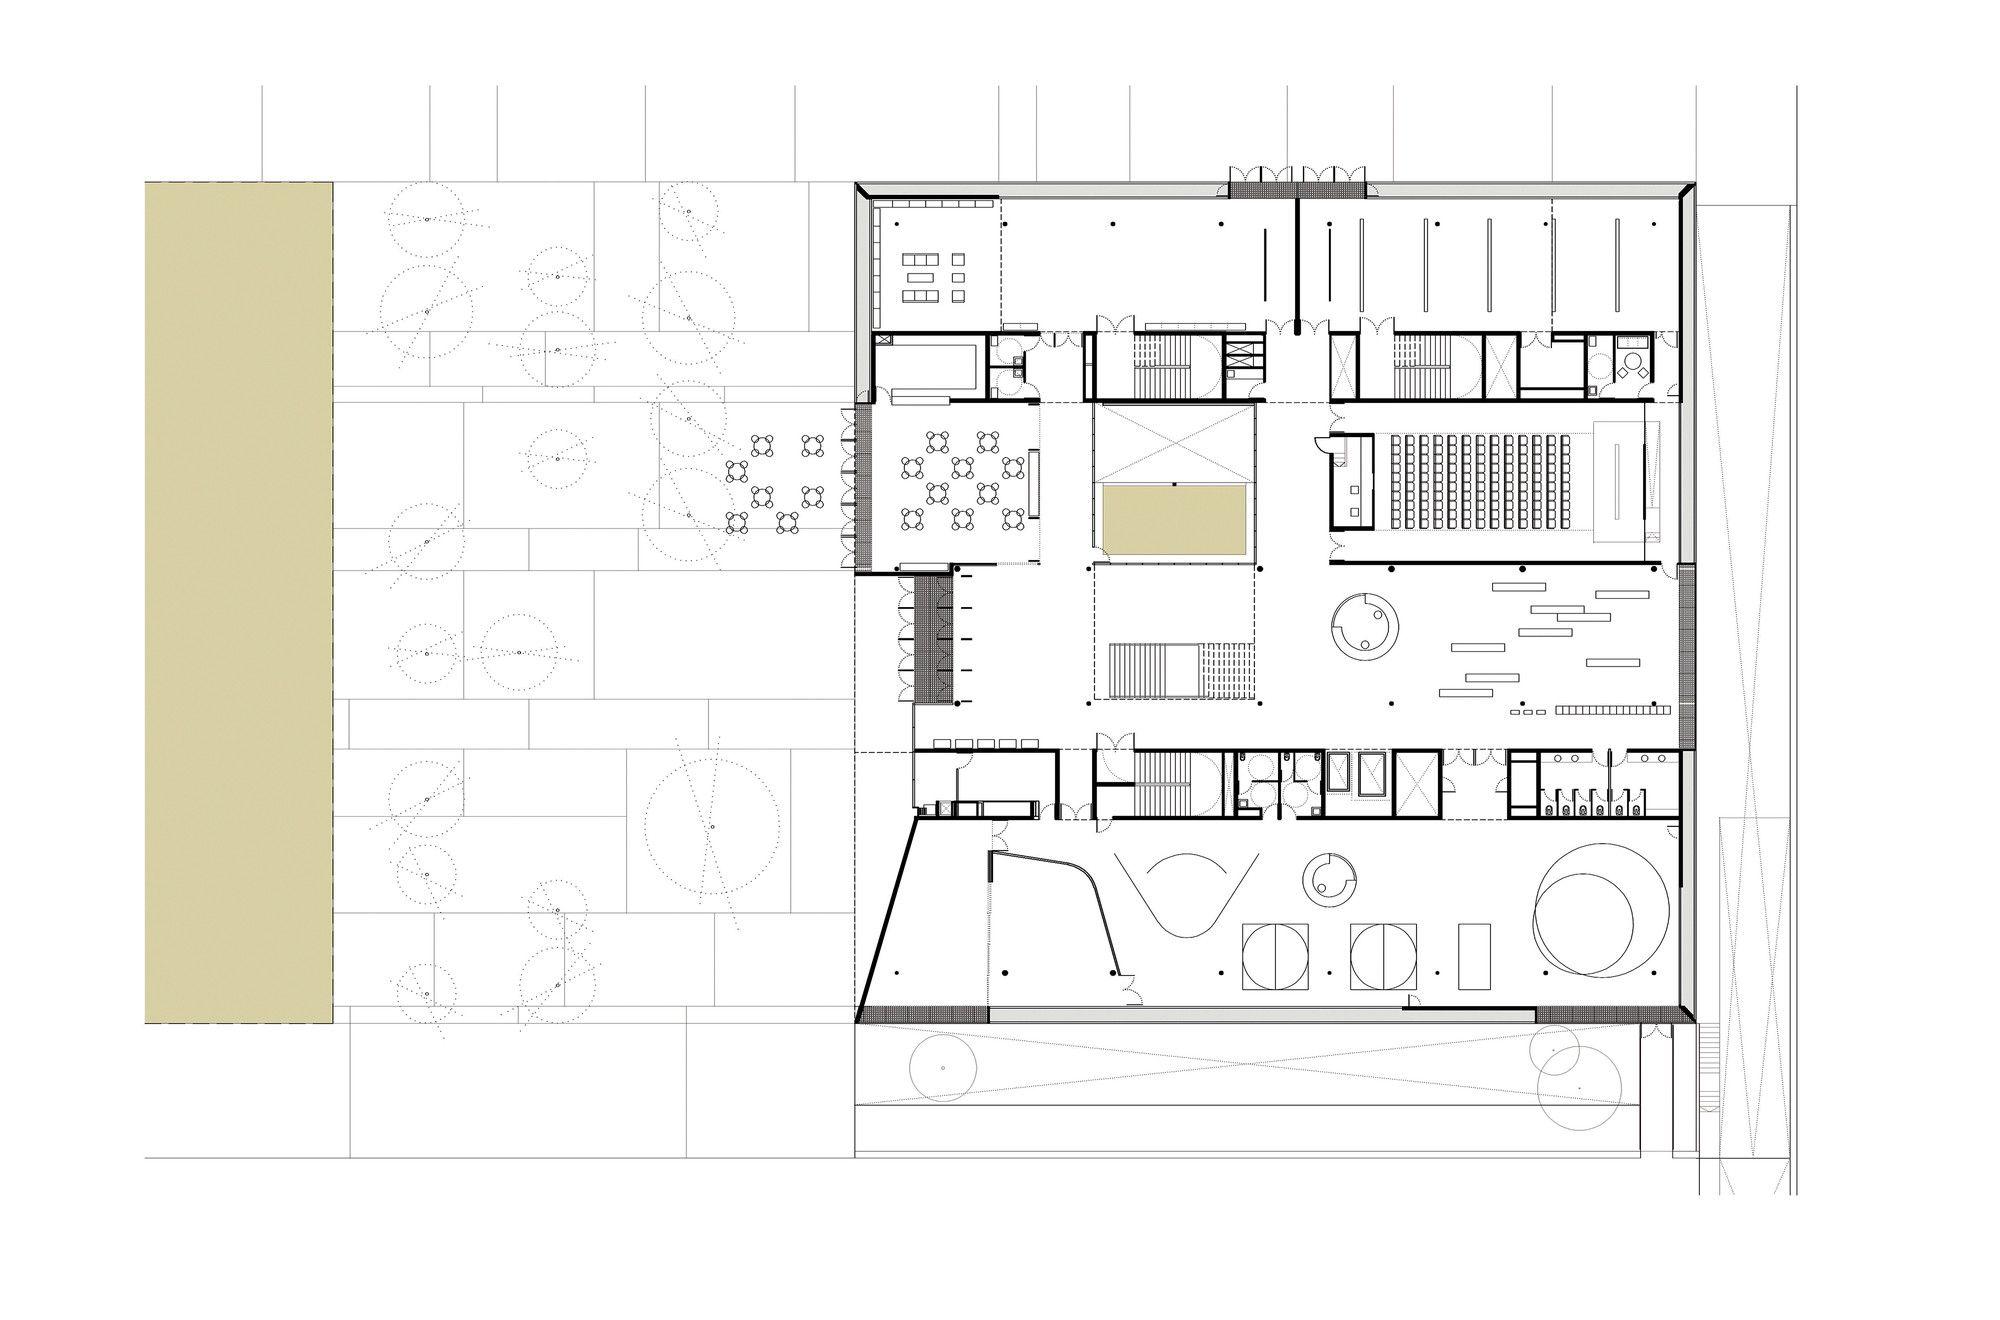 Galeria de biblioteca p blica de girona corea moran for Planta arquitectonica biblioteca